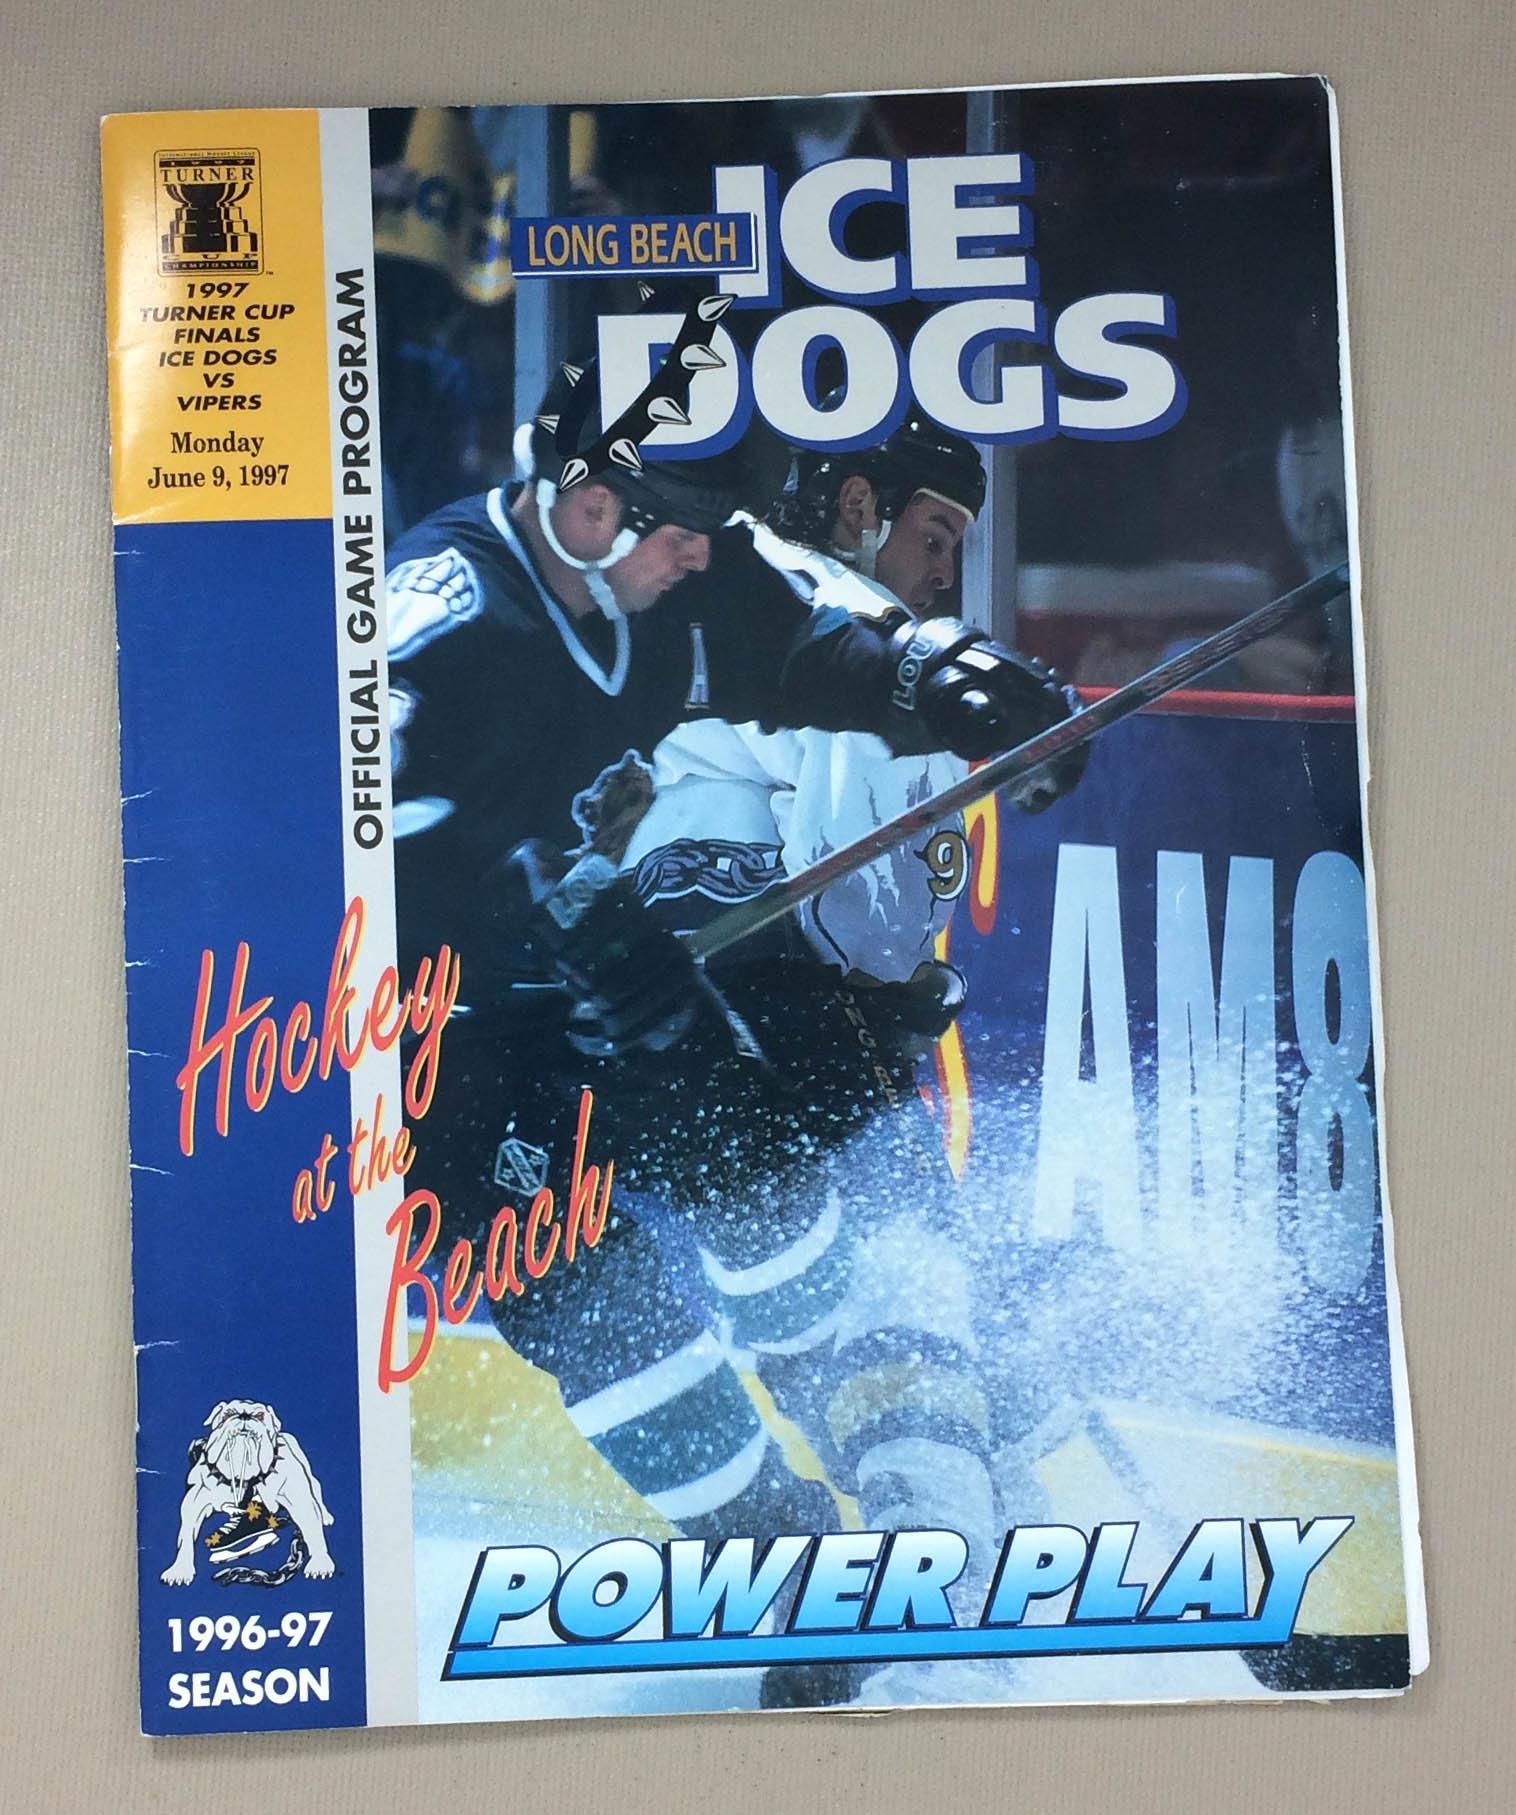 1994-95 IHL Finals Program